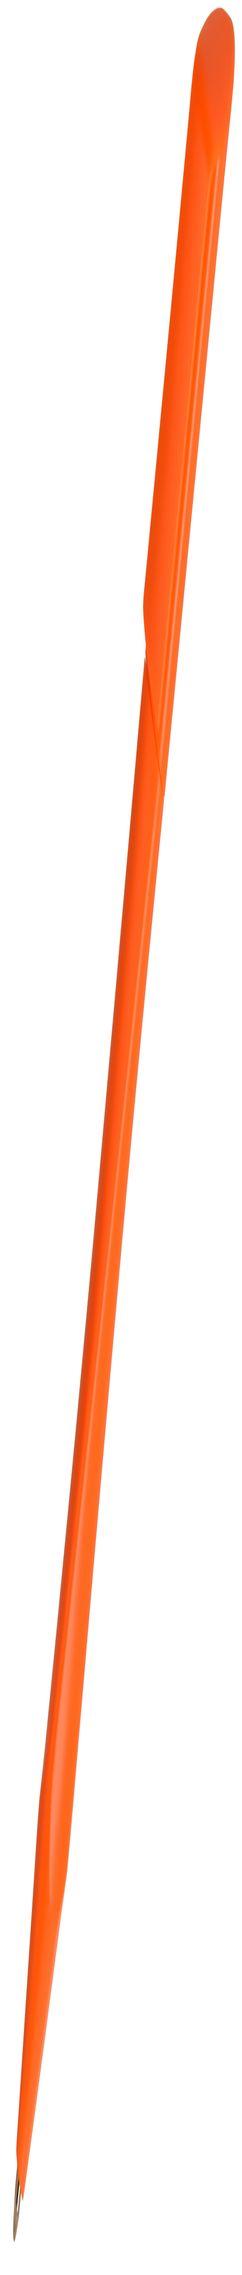 N7, ручка шариковая, оранжевый, пластик фото